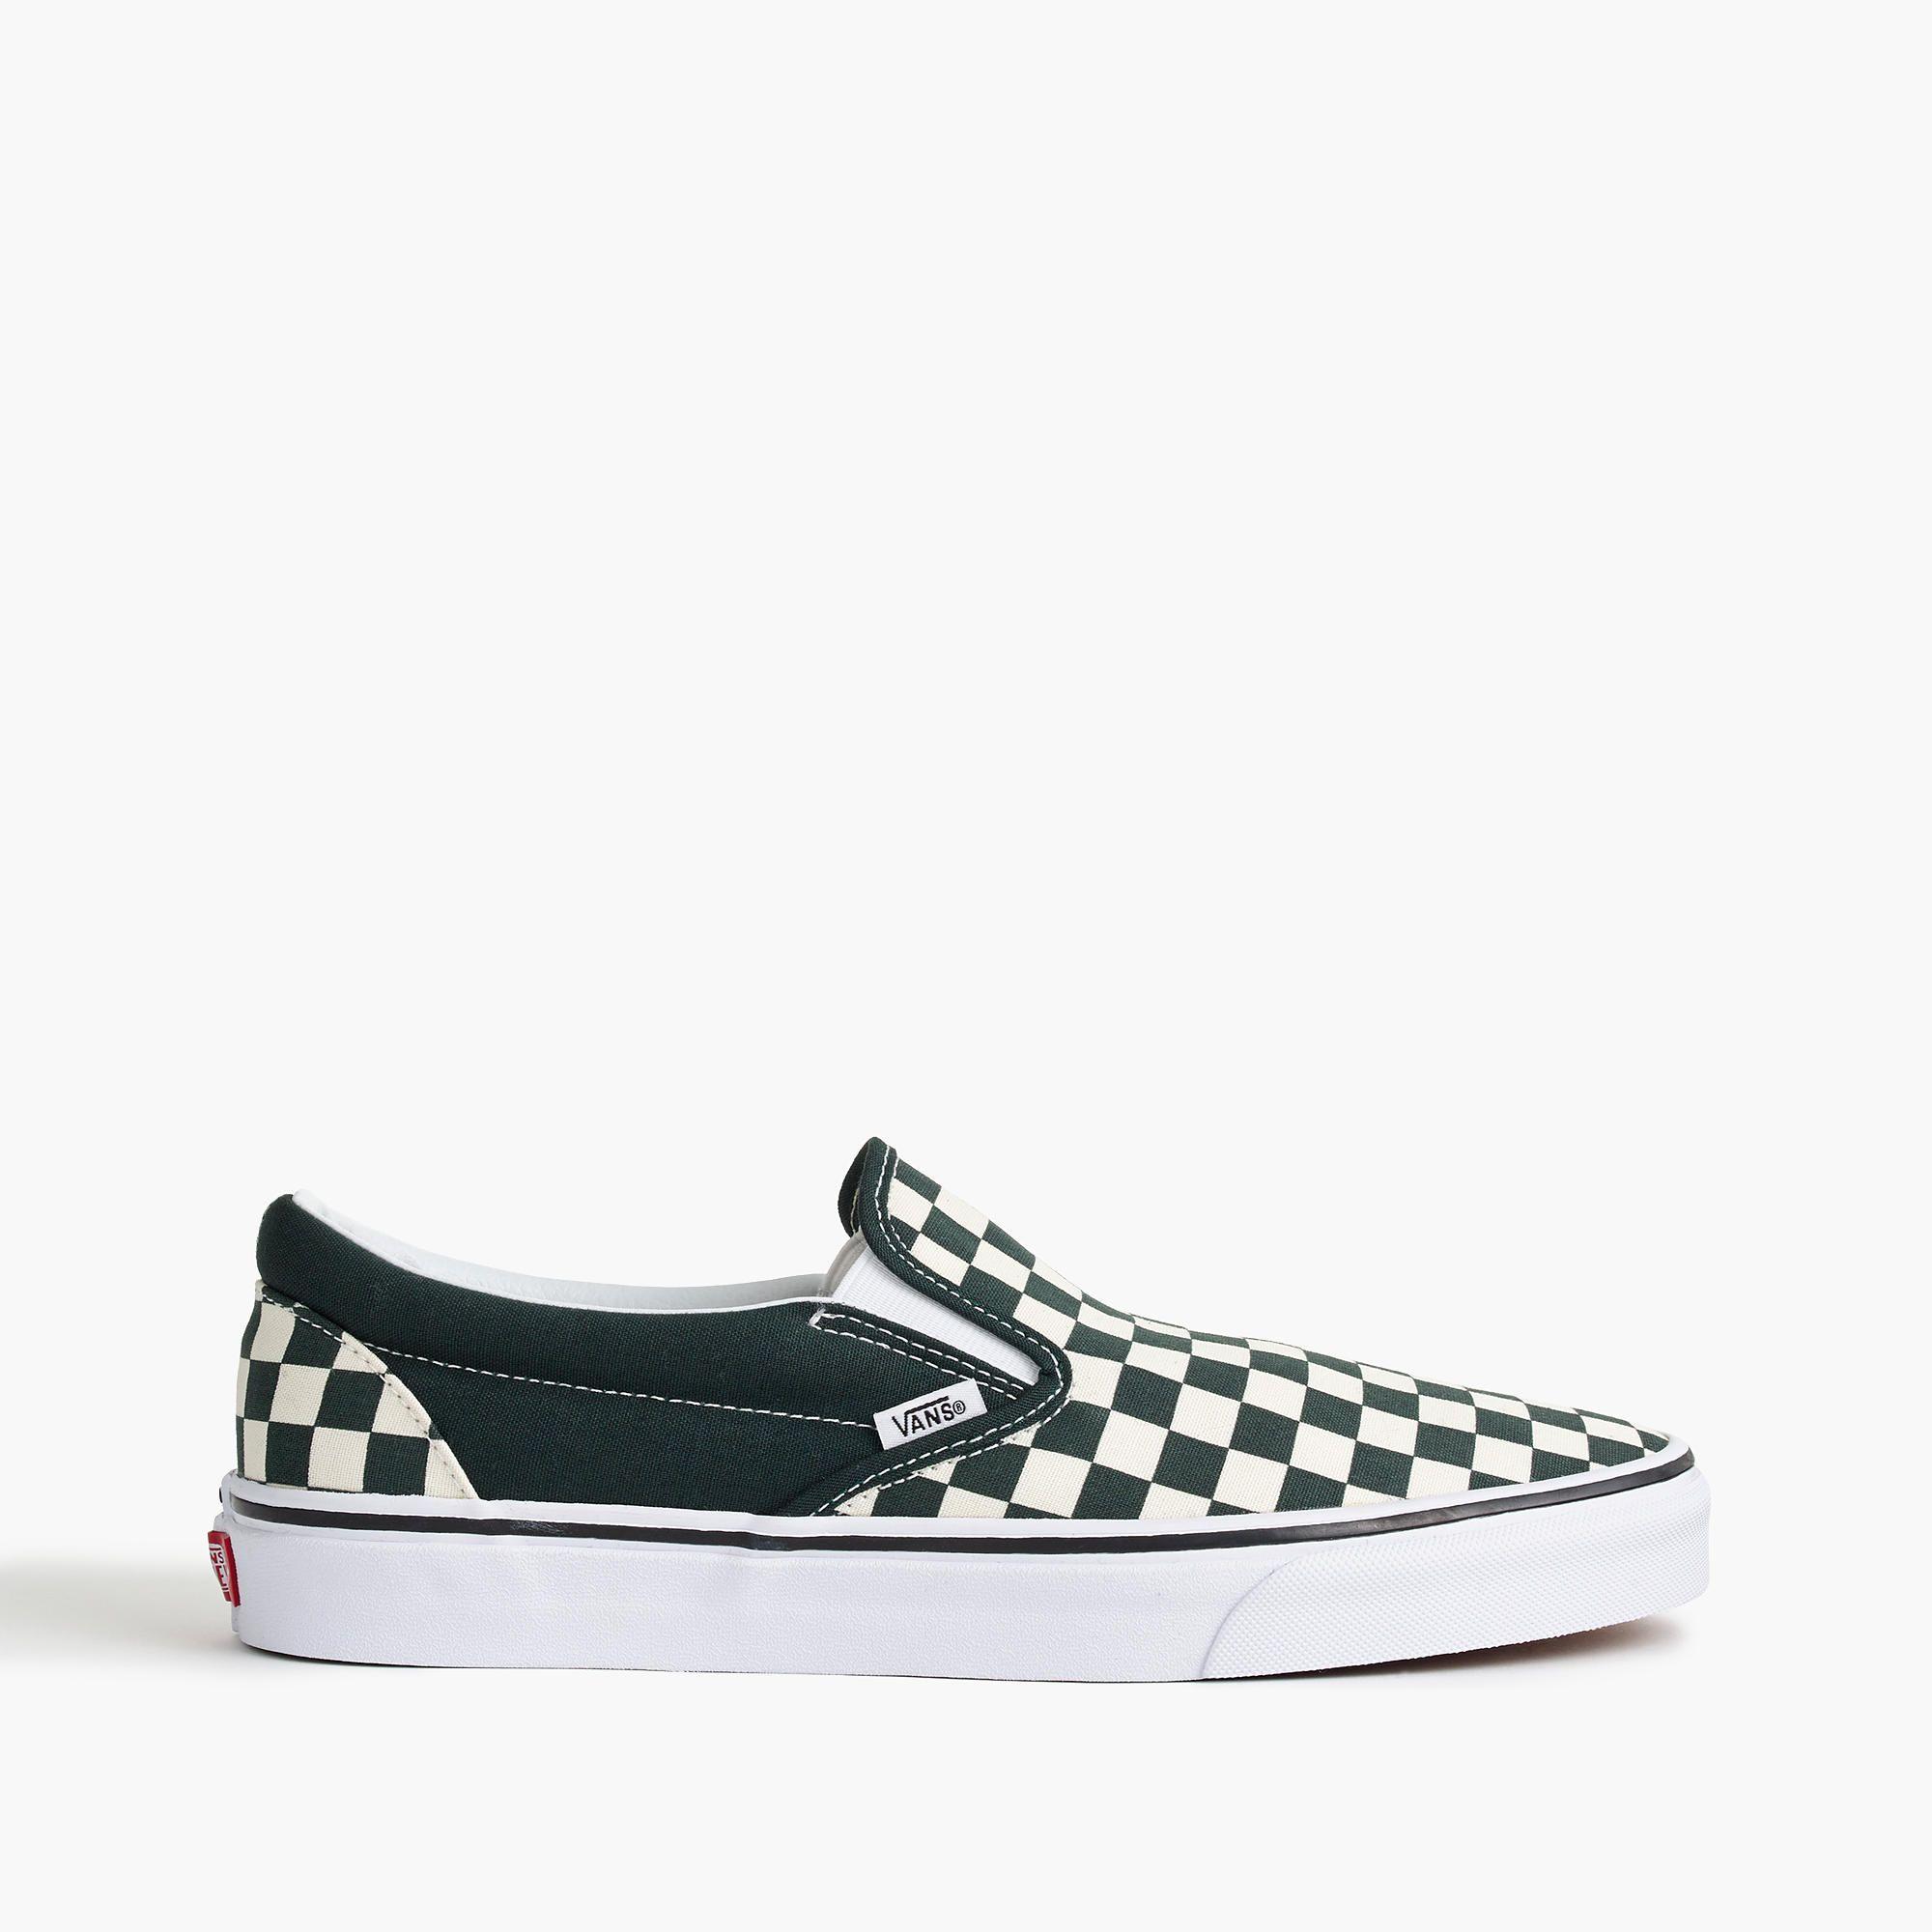 d41e1b7079cd9d J.Crew x Vans Forest Green Checkerboard Slip-Ons